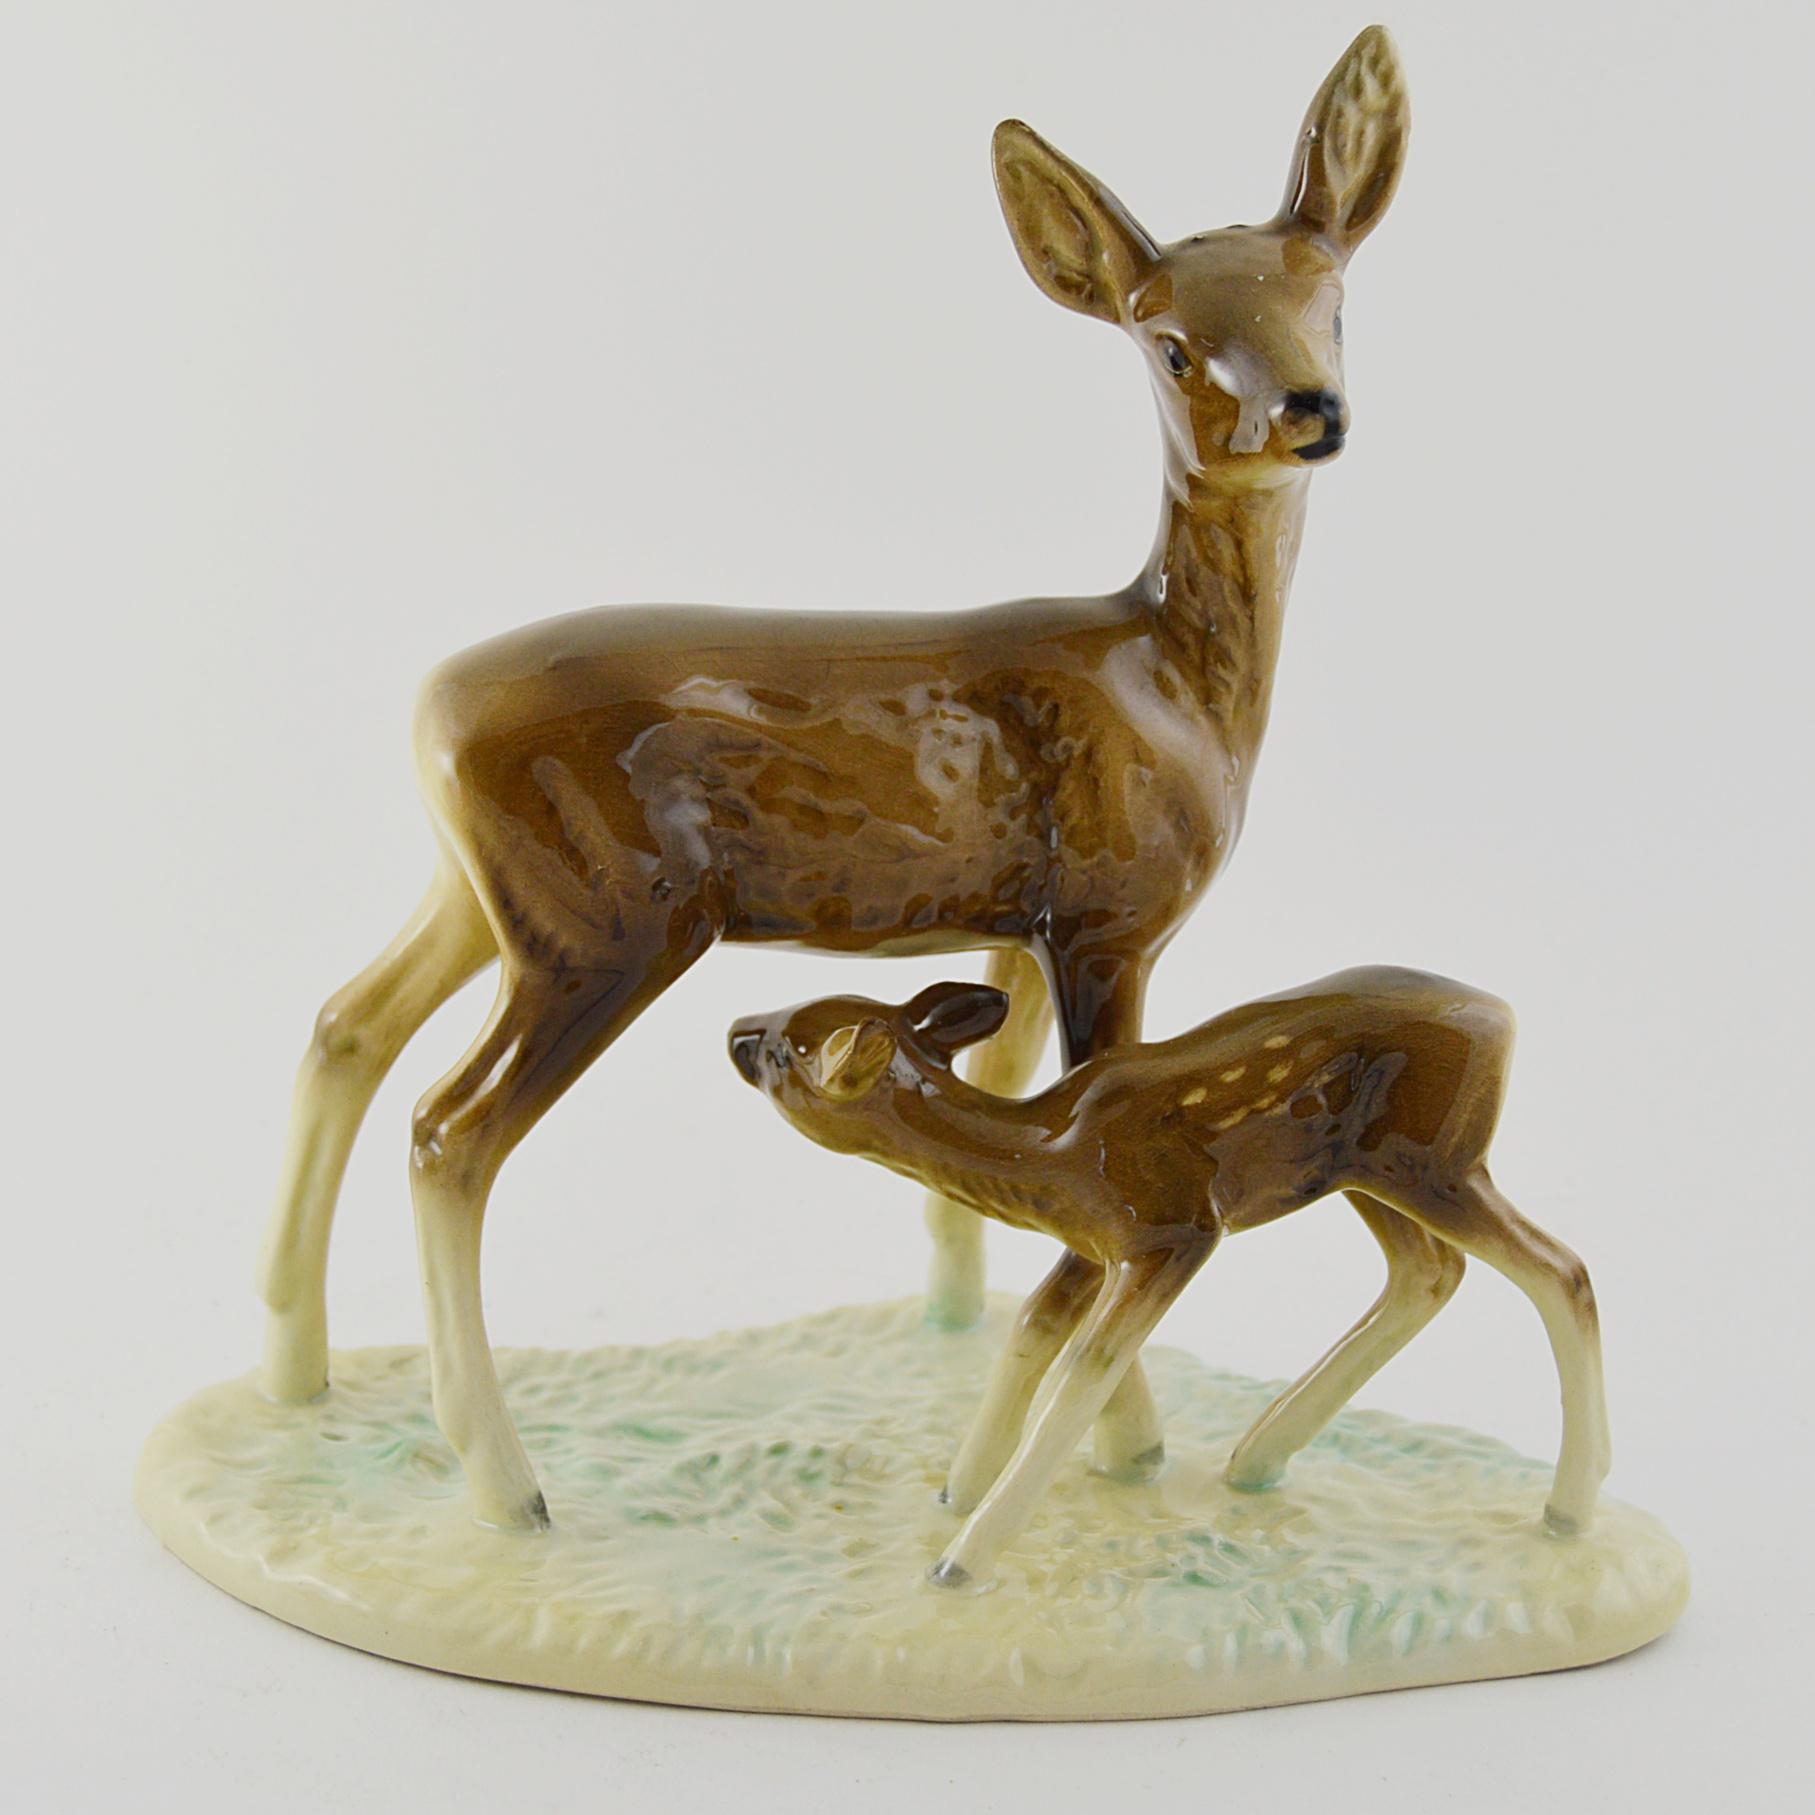 Vintage Porcelain Figure Deer Figurines